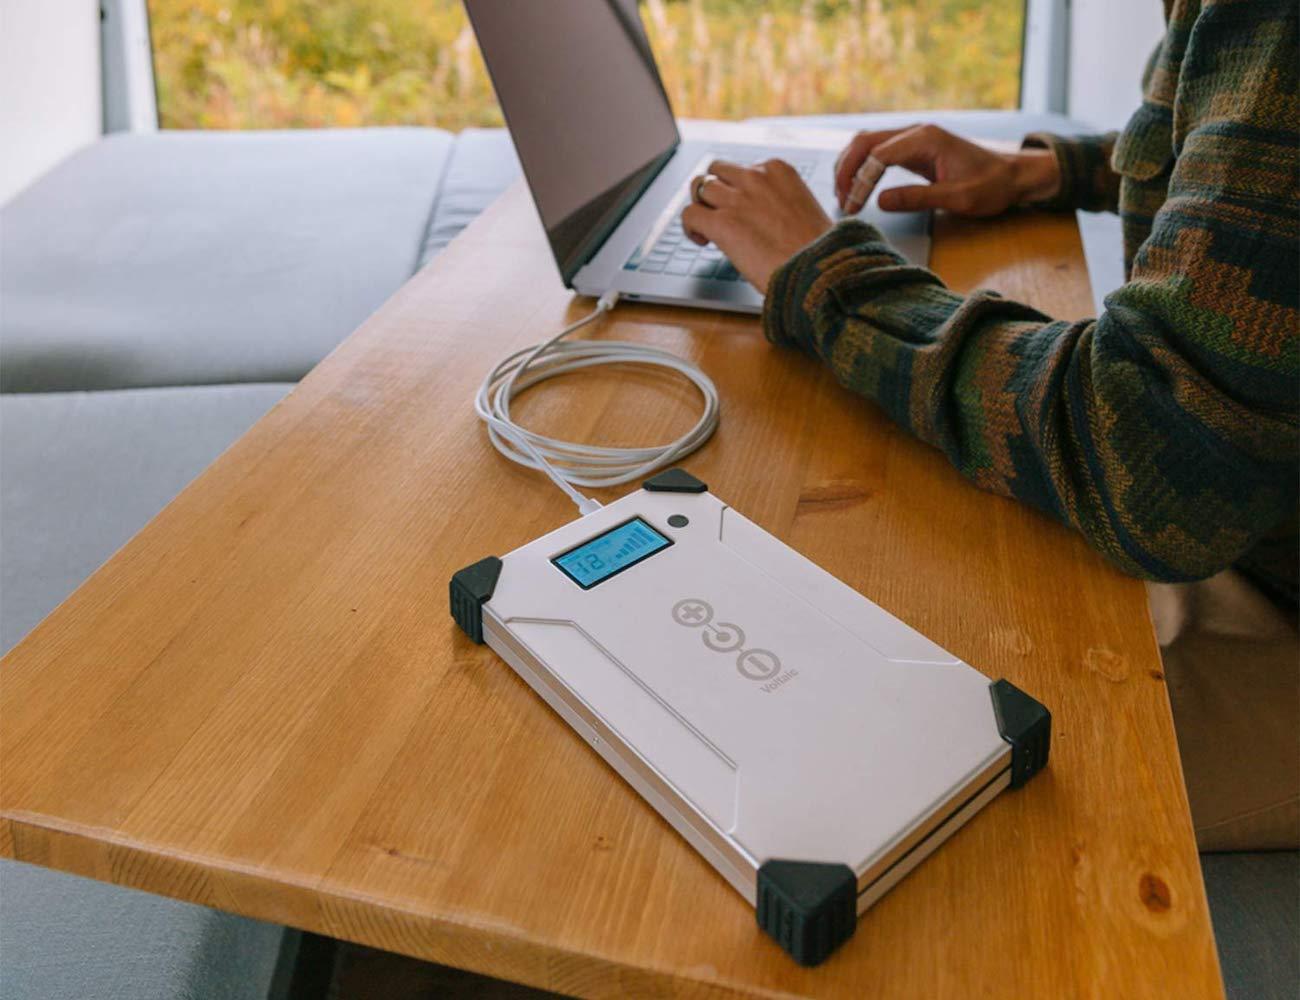 Voltaic V88 Portable Laptop Battery